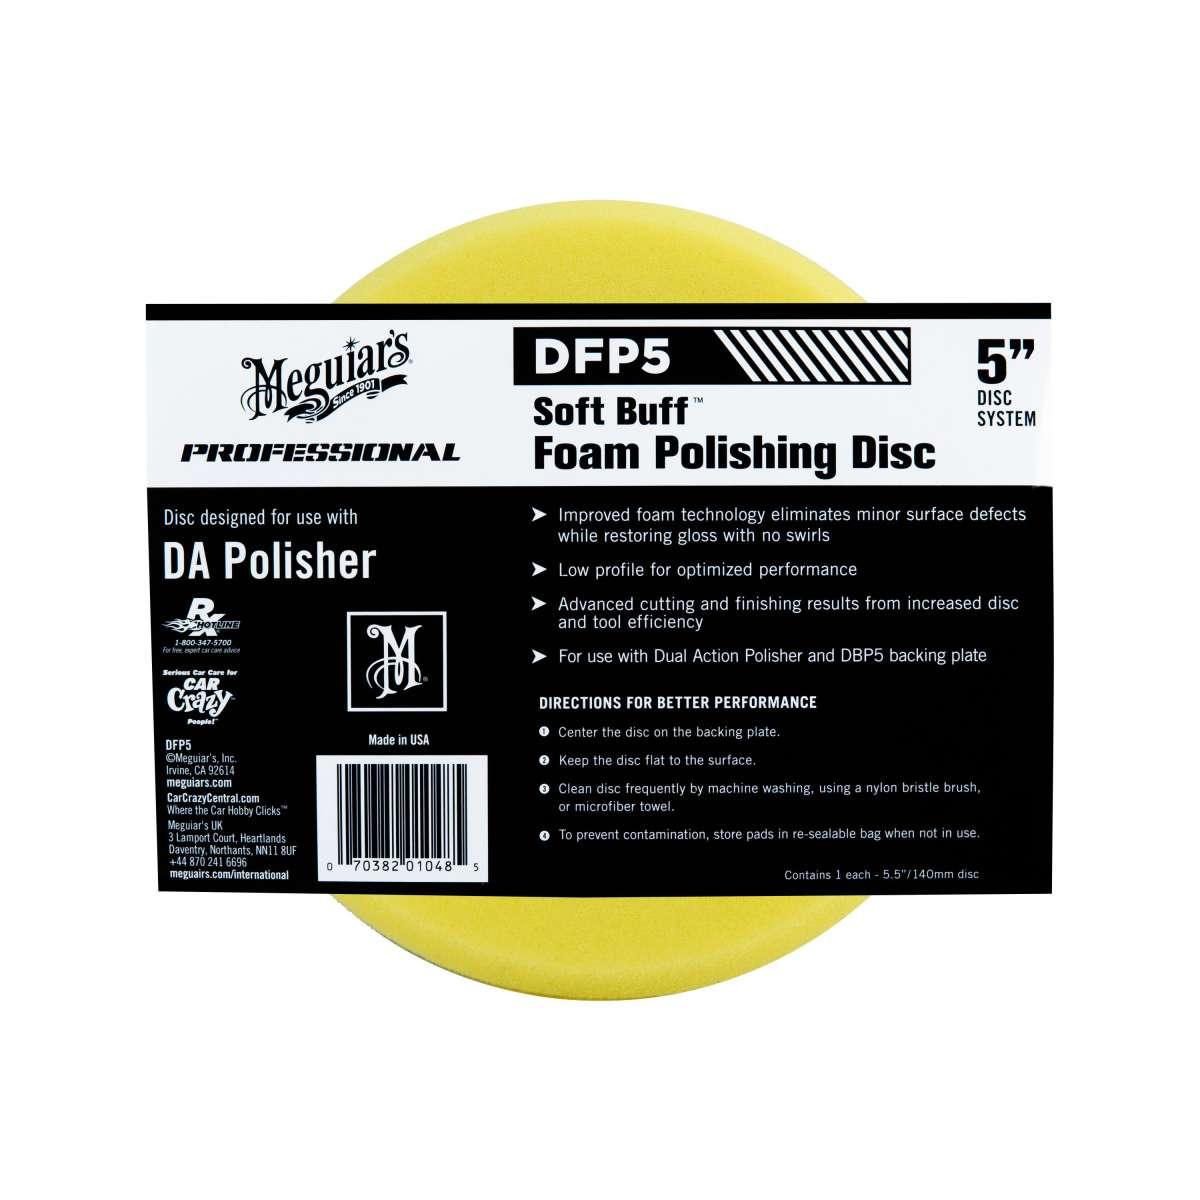 "Meguiar's Soft Buff Foam Polishing Disc 5"""